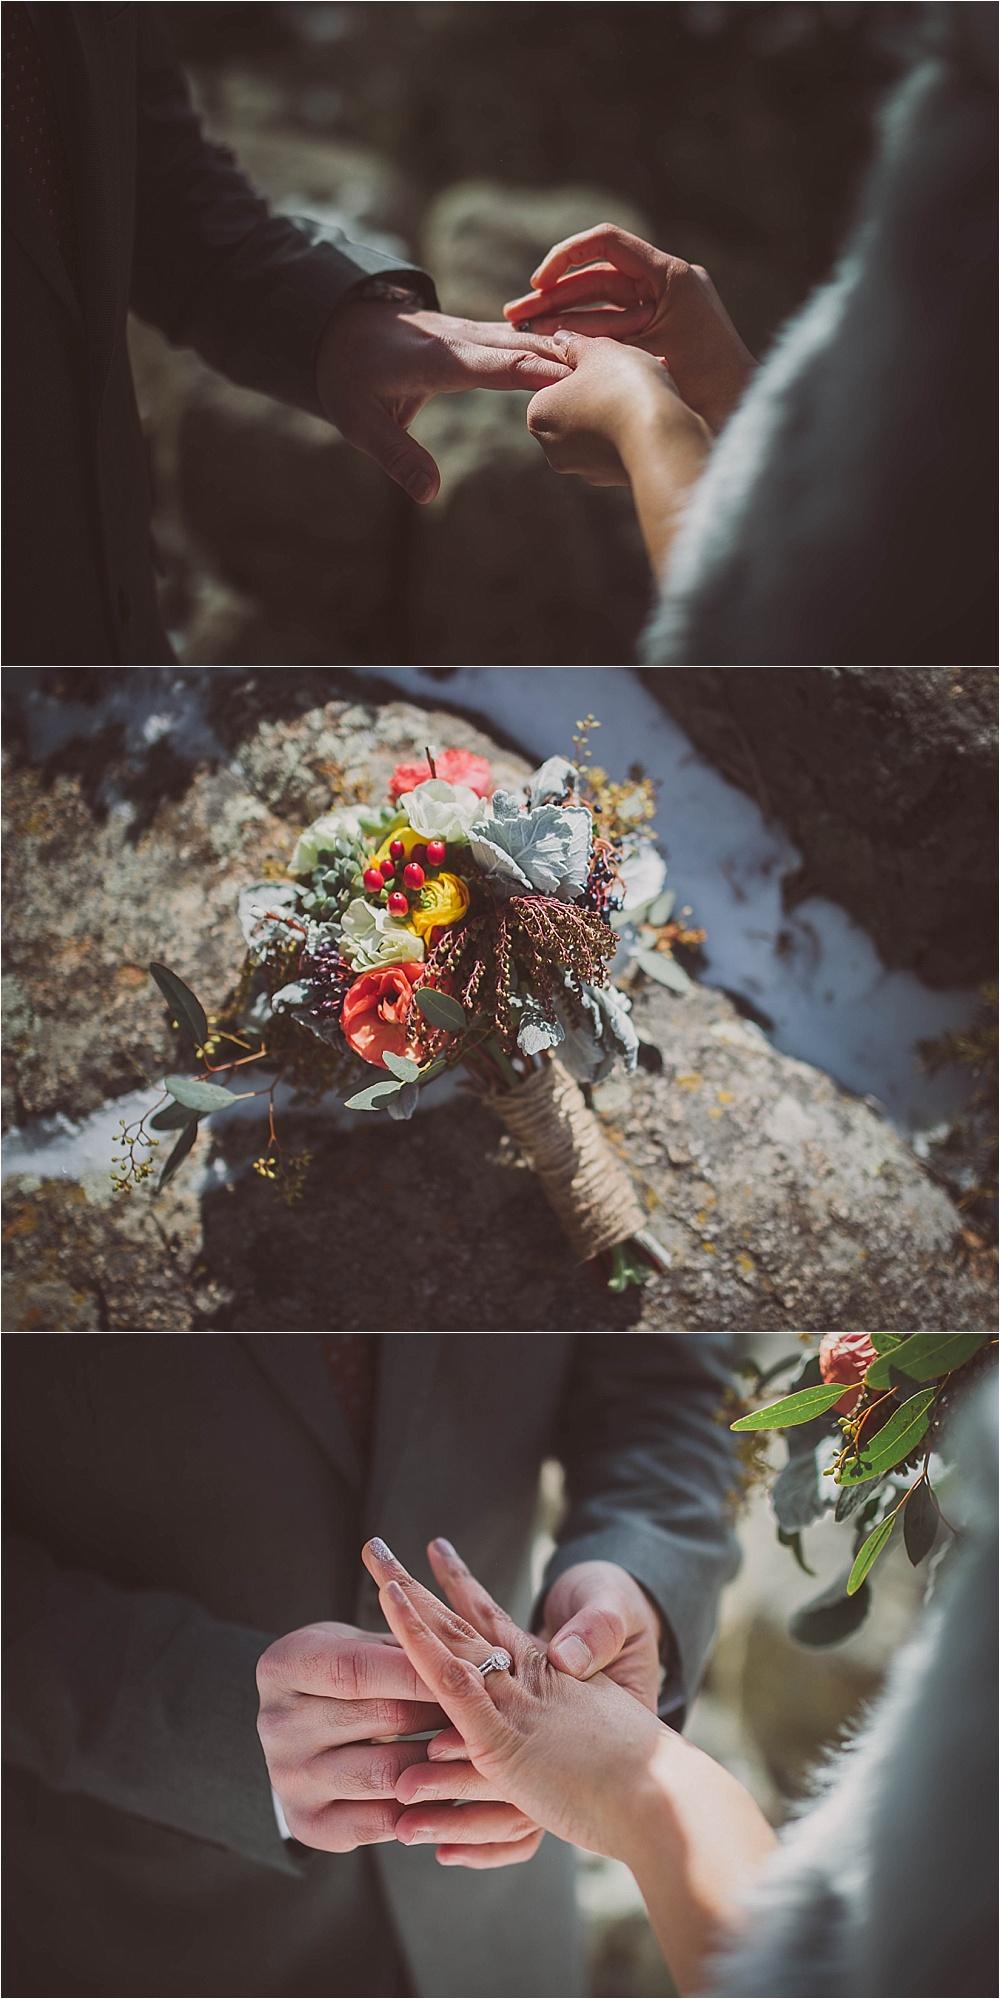 manzanita photo by rebecca caridad wedding lifestlye photography floral design calligraphy_1218.jpg